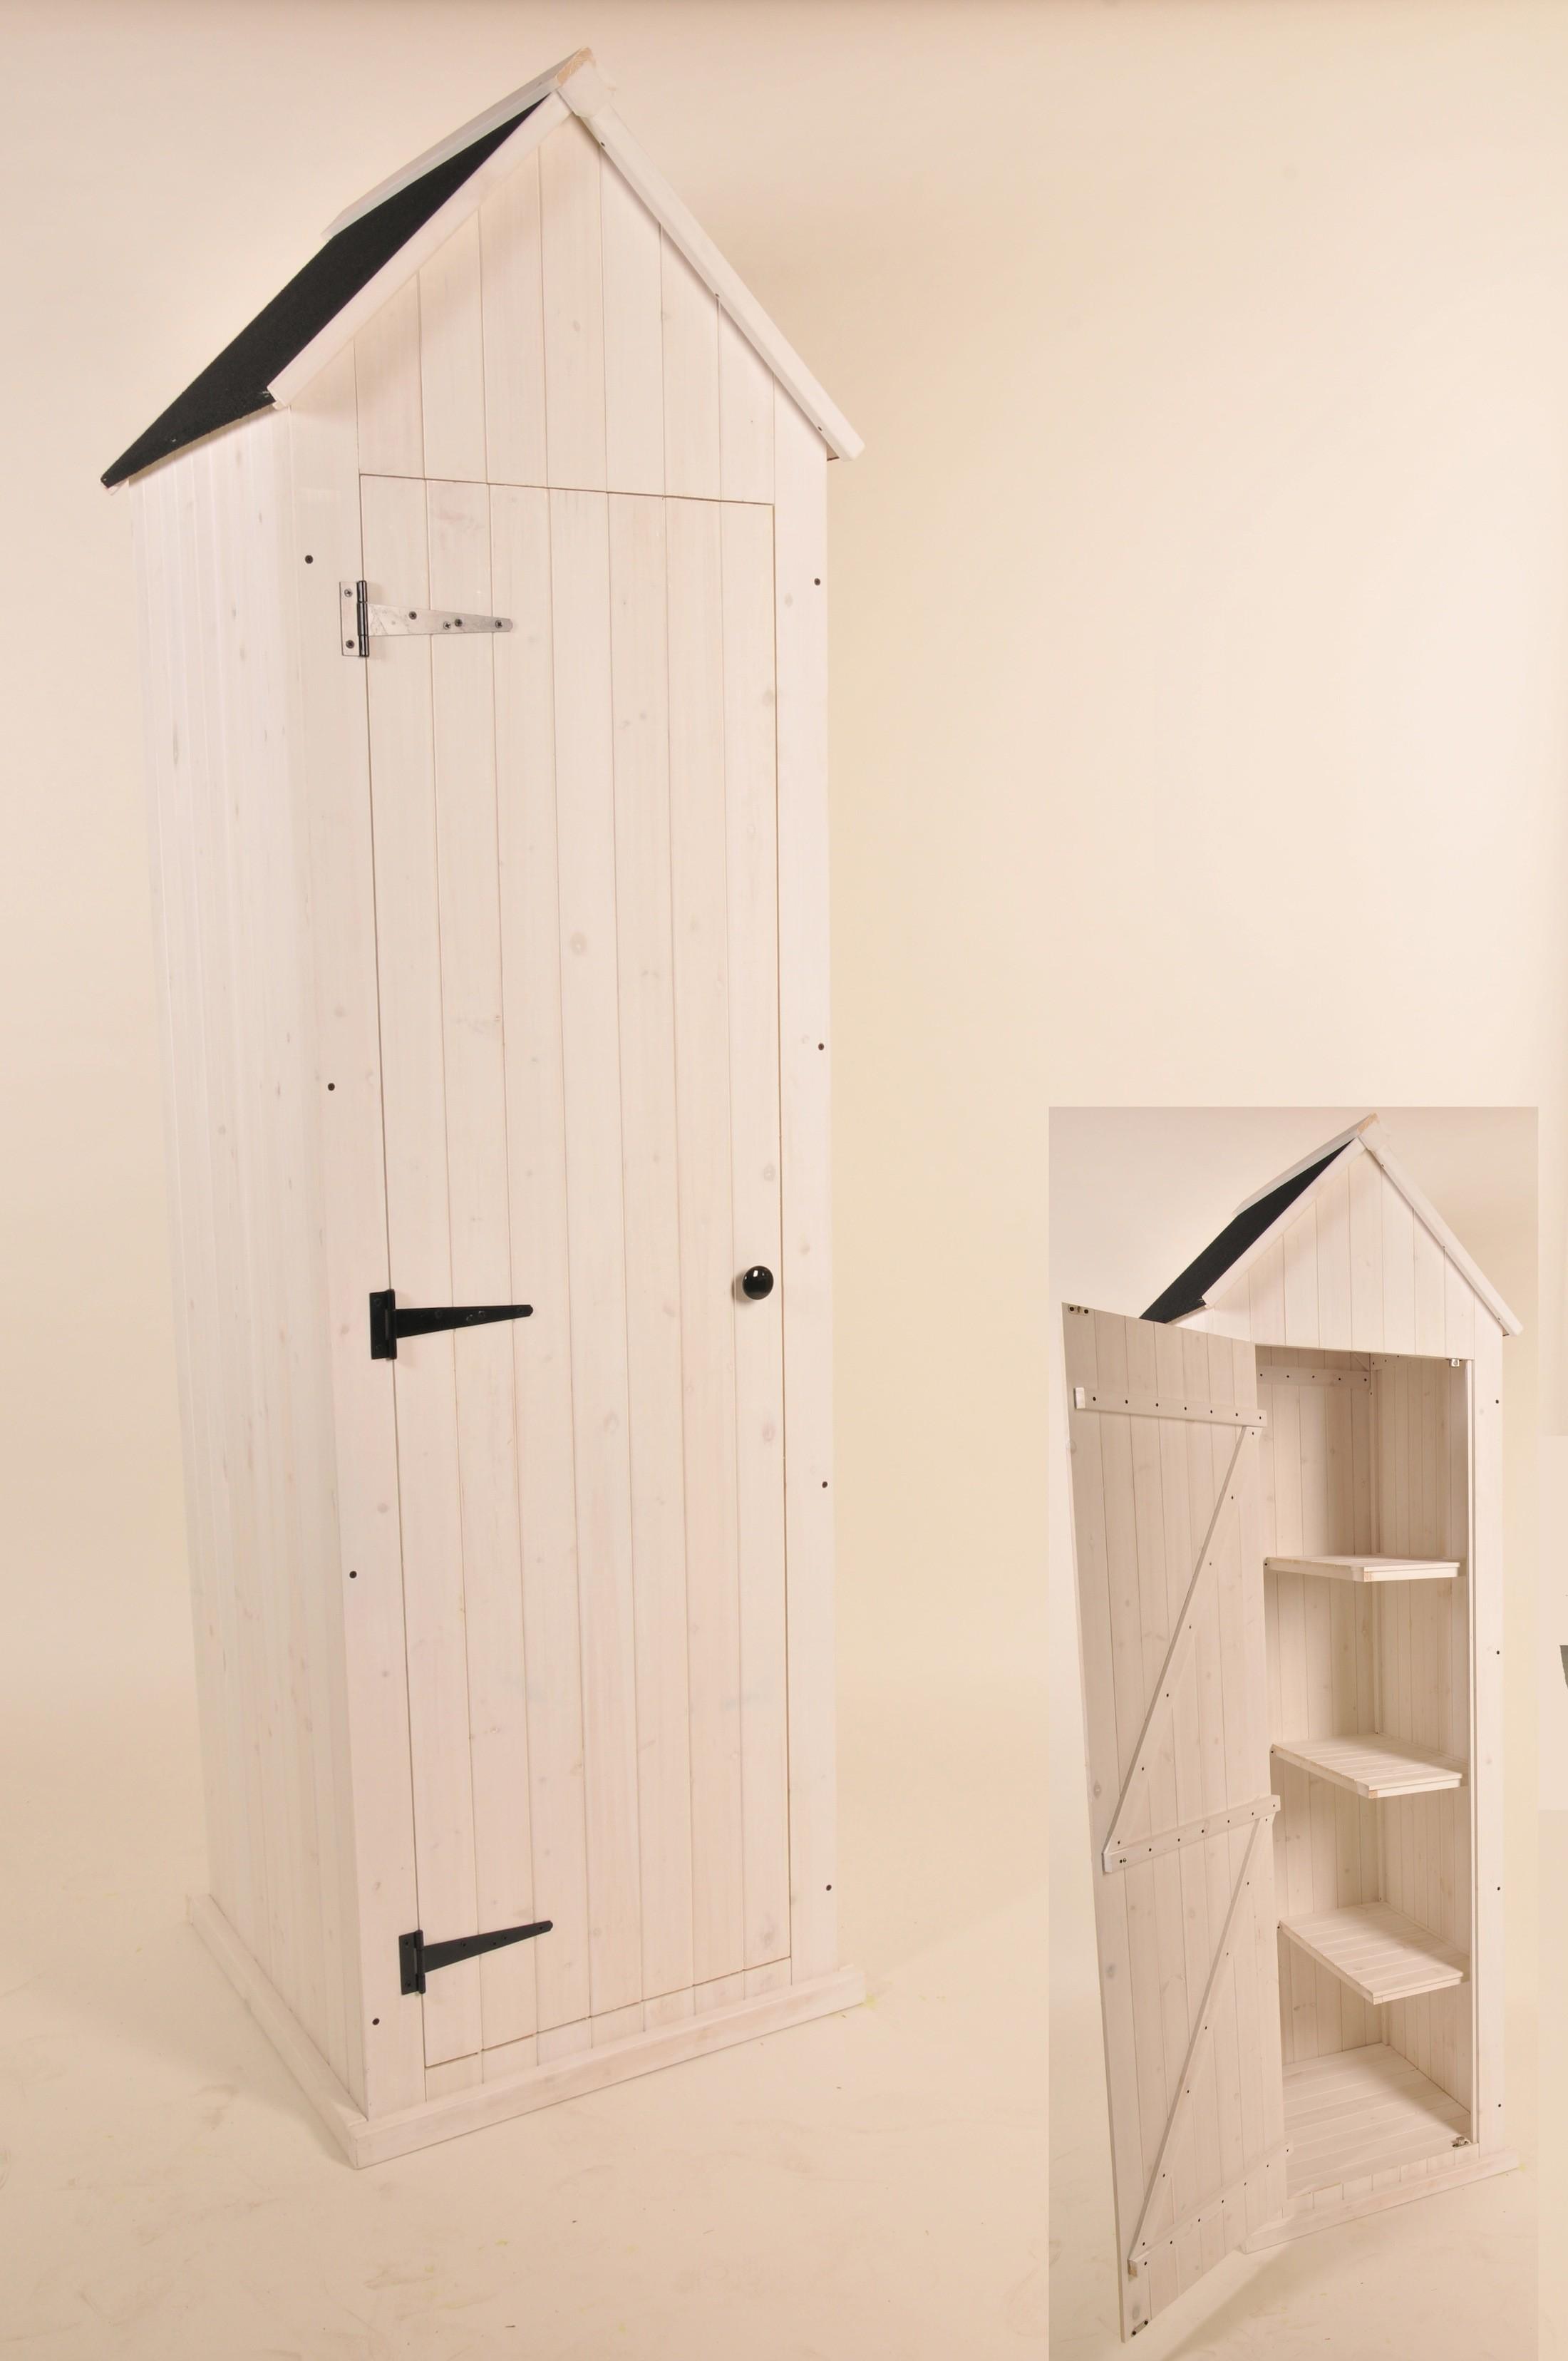 meuble cabine de plage interesting armoire cabine de plage occasion armoire cabine de plage. Black Bedroom Furniture Sets. Home Design Ideas